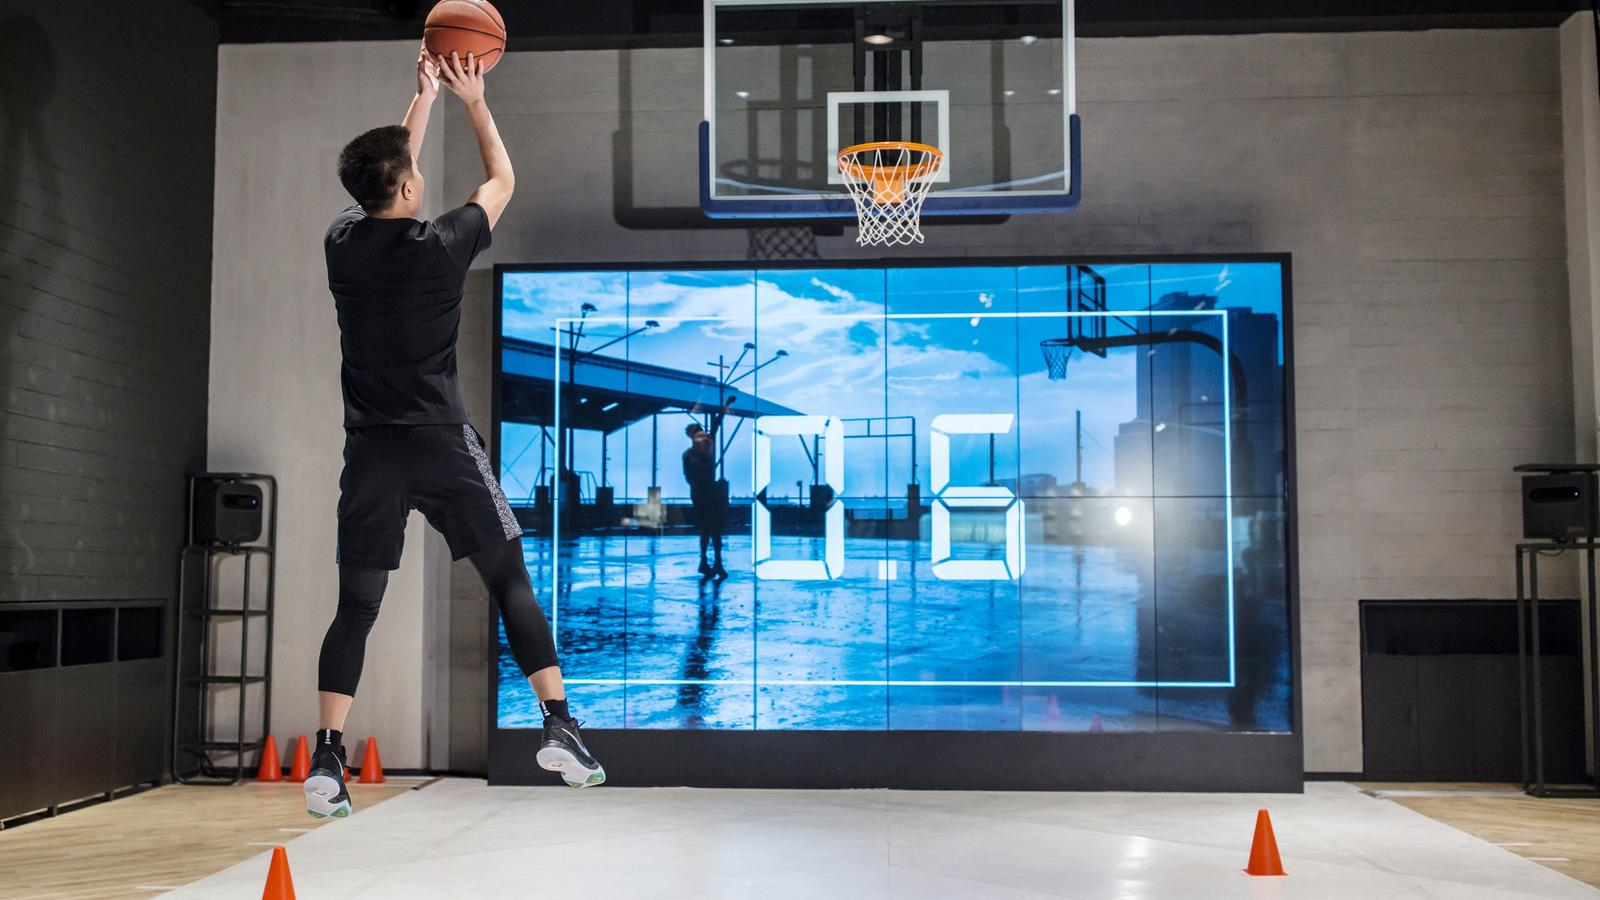 First Look: Inside the Nike & Jordan Basketball Experience ...